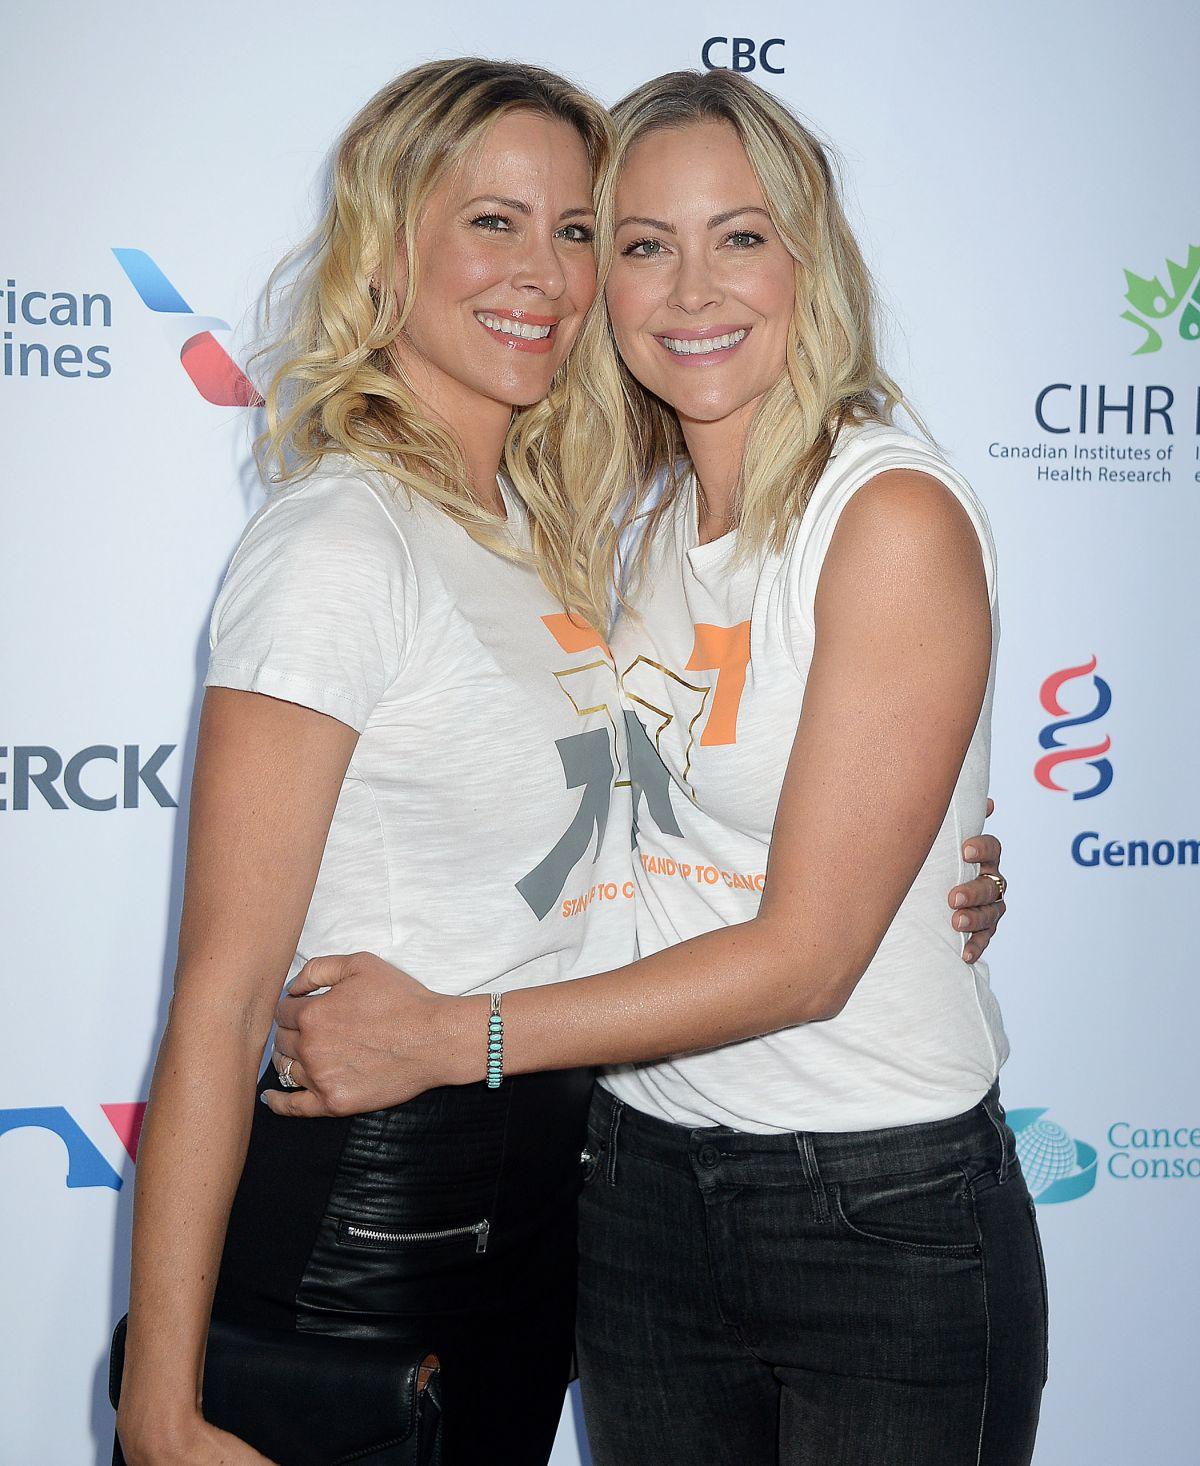 Brittany Daniel & Cynthia Daniel Snow At 5th Biennial Stand Up To Cancer, Los Angeles